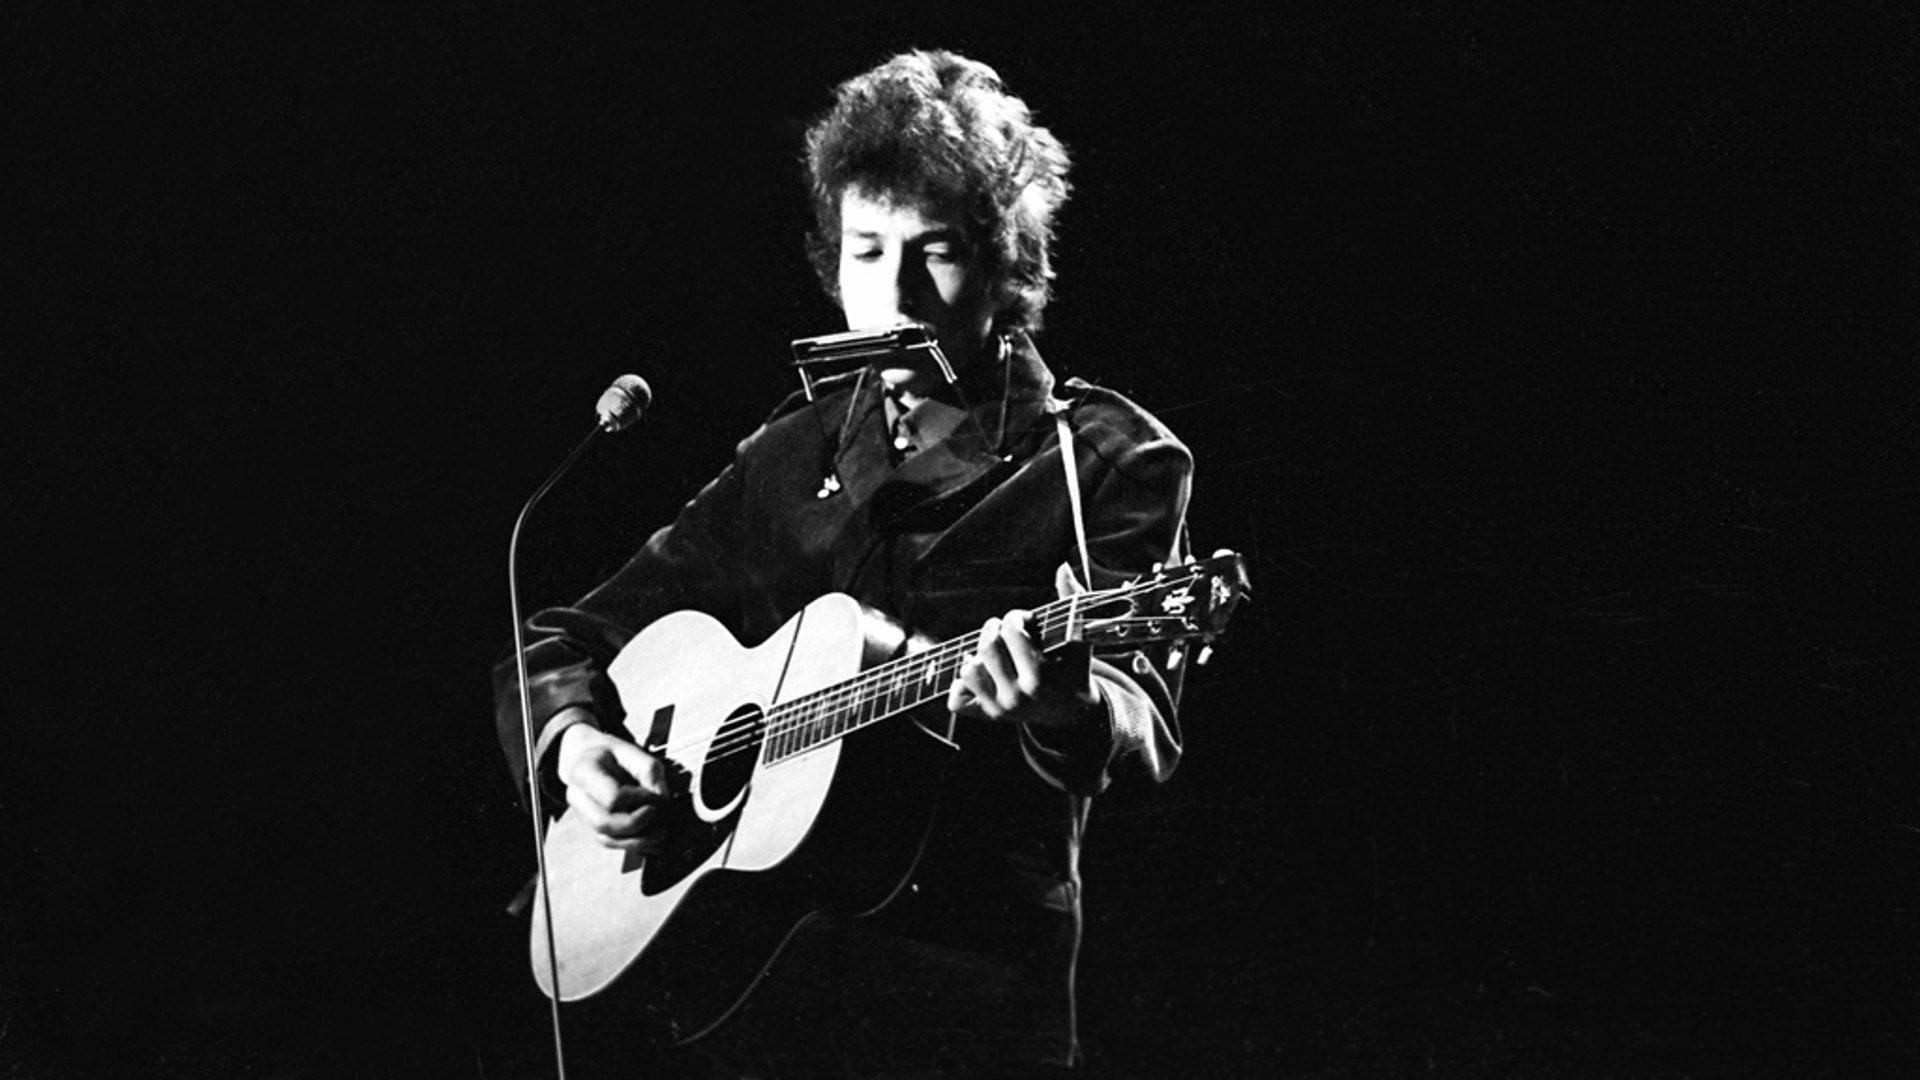 2560x1440 Download In Original Resolution Bob Dylan HD Desktop Wallpapers 7wallpapersnet